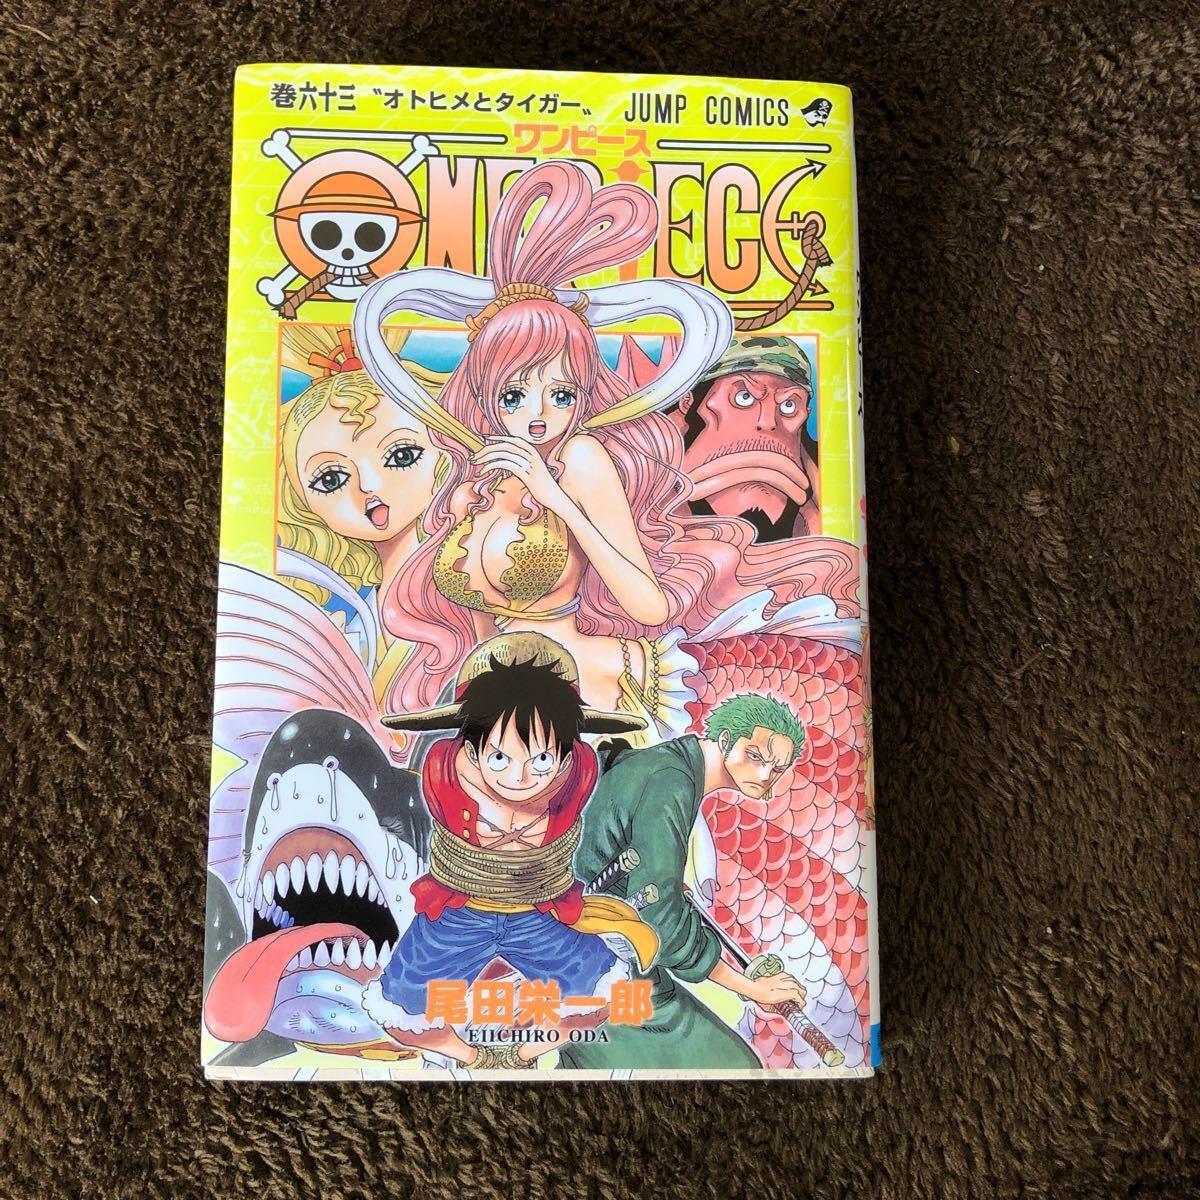 ONE PIECE 尾田栄一郎 ワンピース 漫画コミック 64   63 巻六十四 巻 六十三